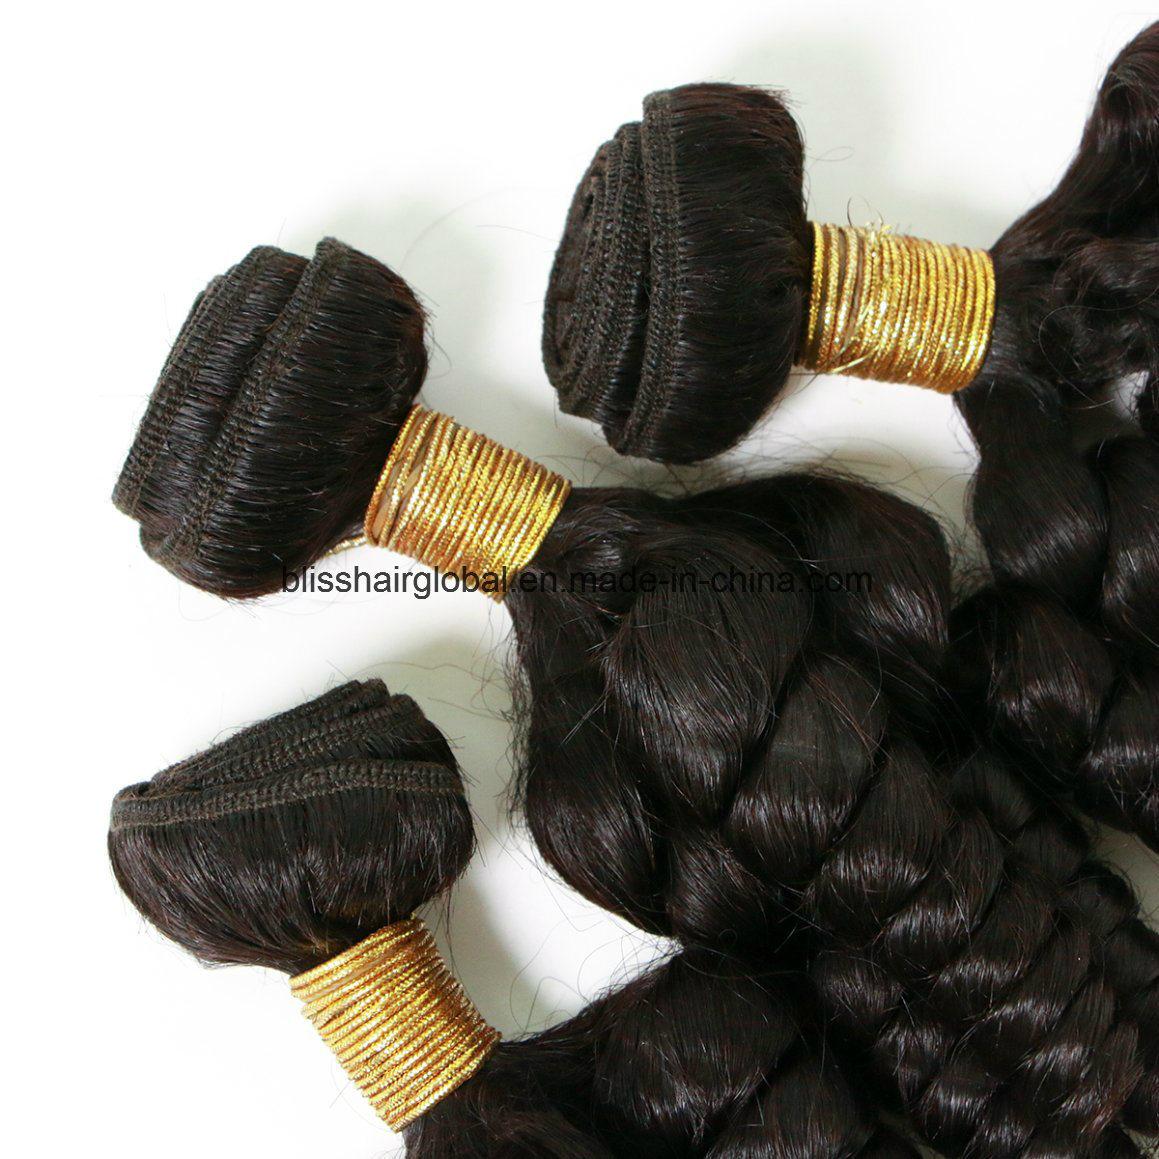 Brazilian Virgin Hair Movado Curl Natural Color Human Hair